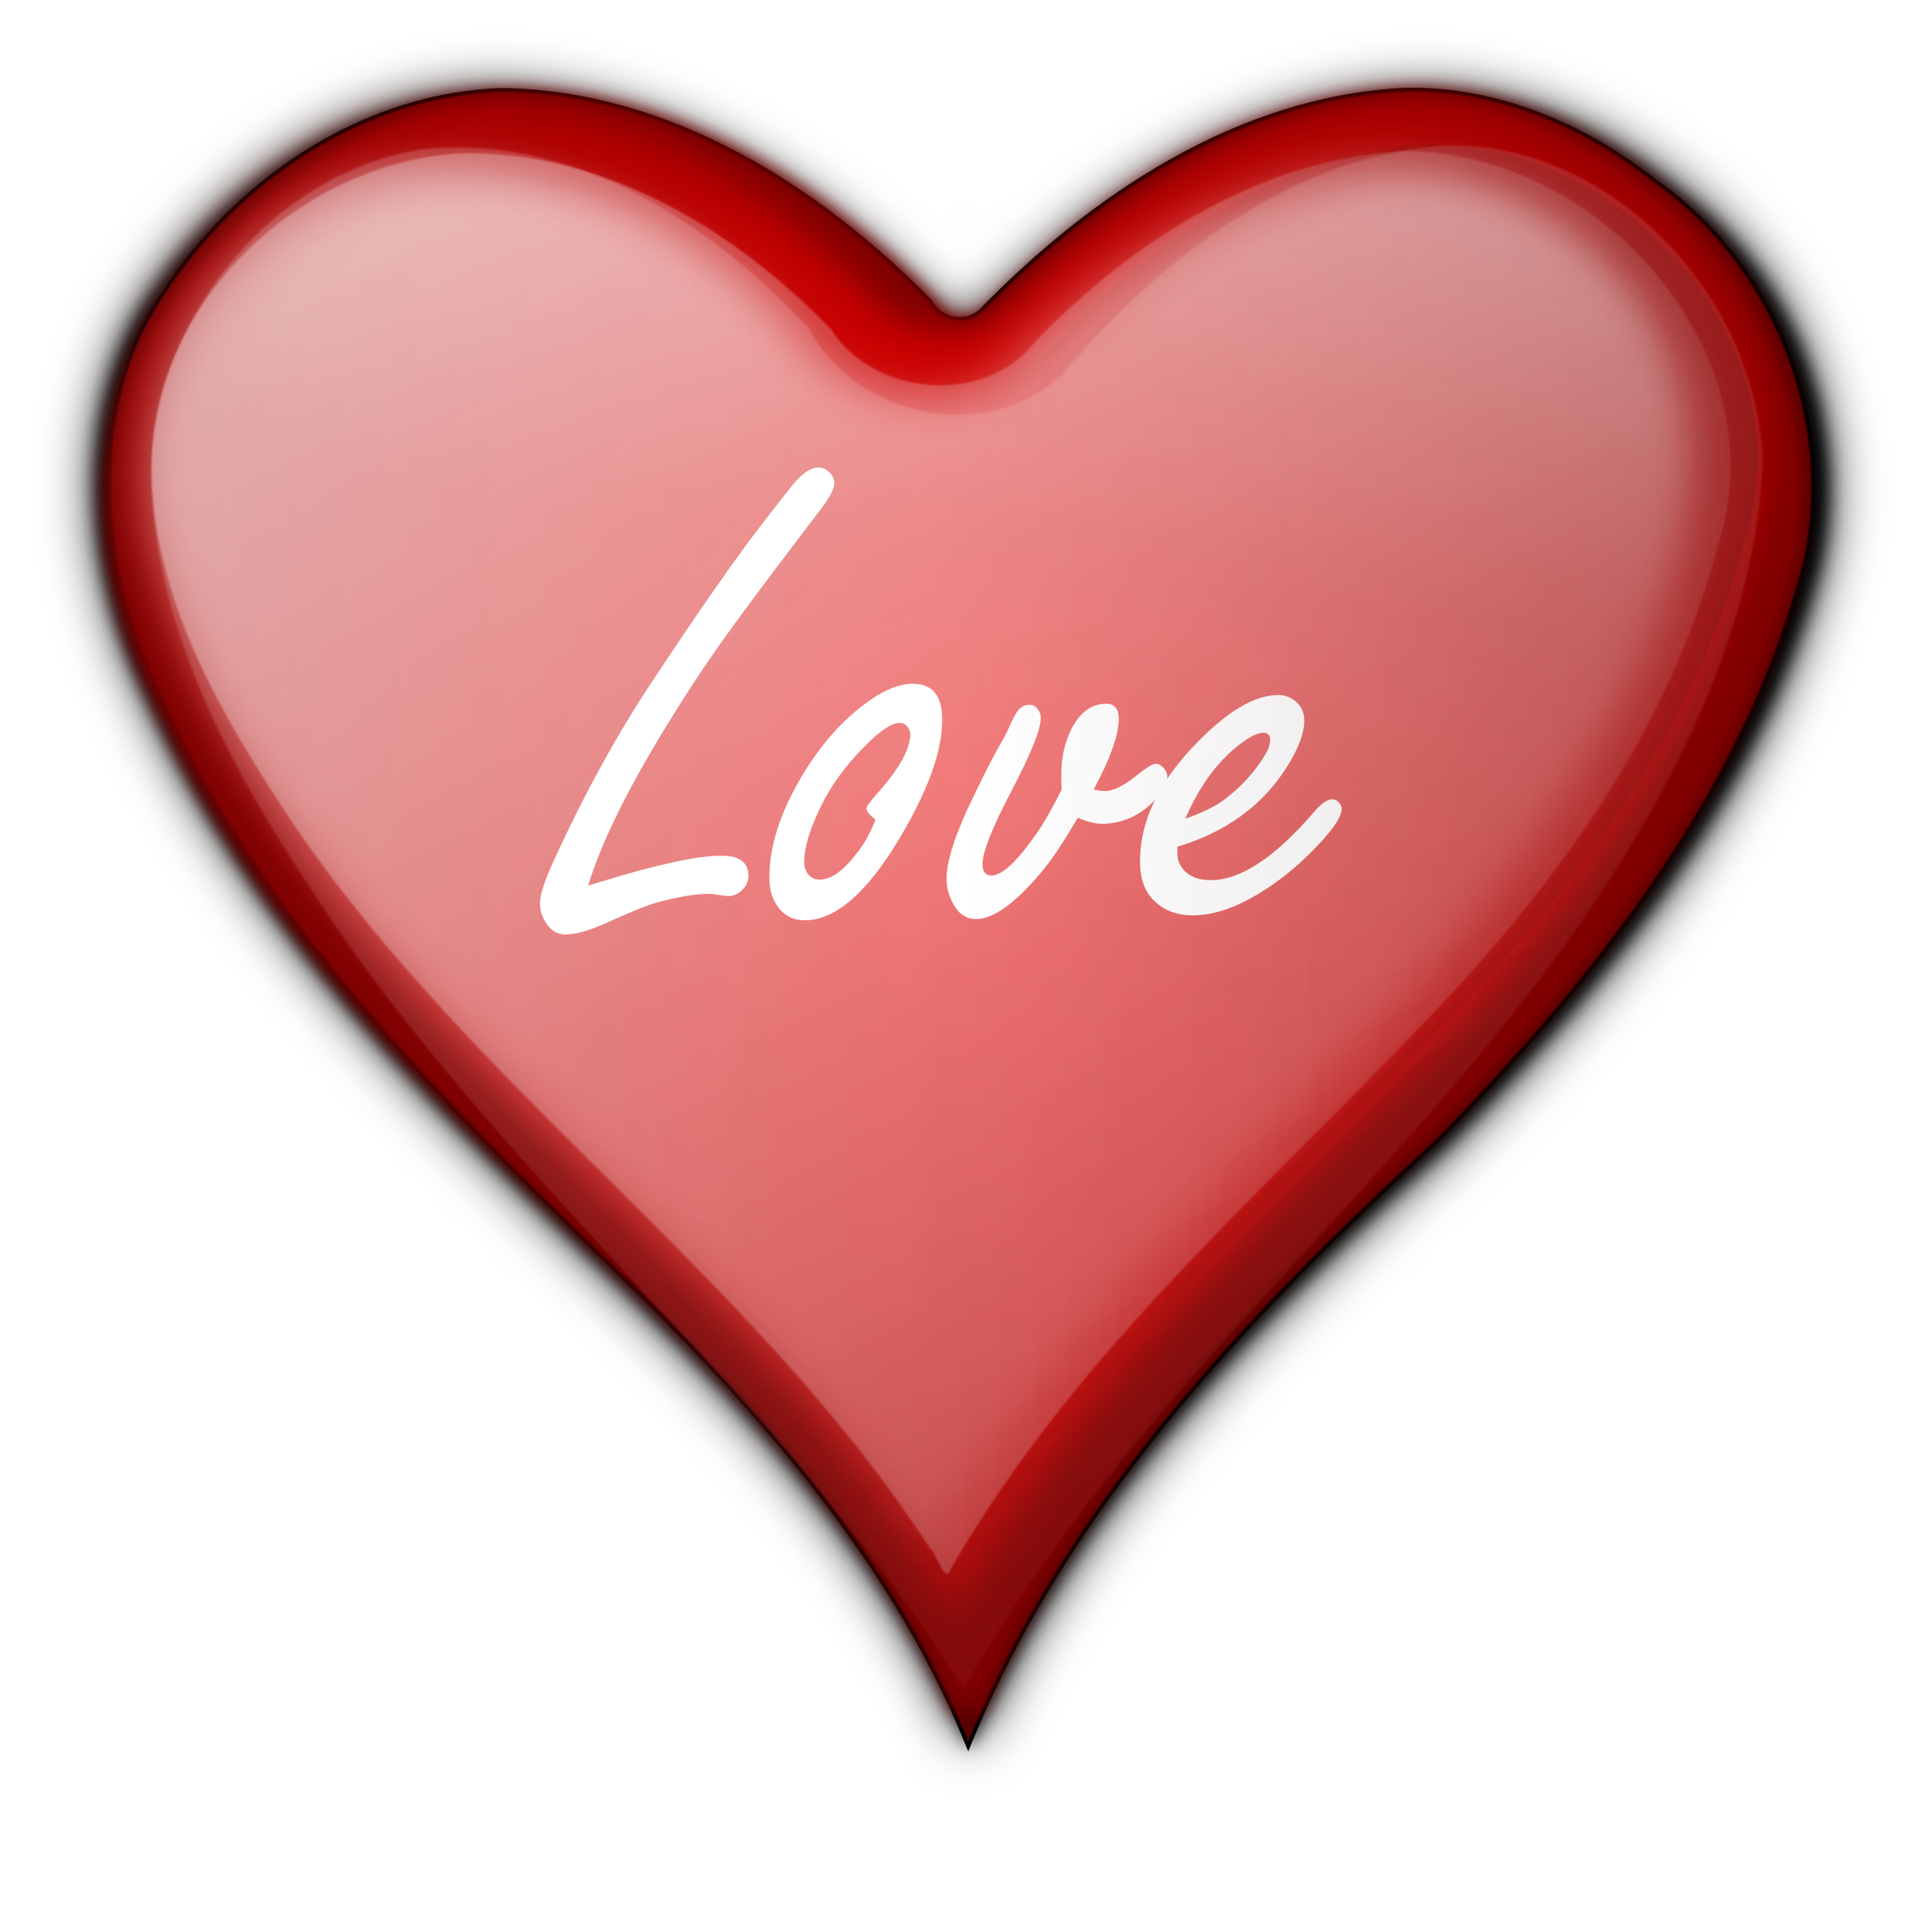 Small heart clipart free jpg freeuse stock Clipart - Heart Gloss 4 jpg freeuse stock